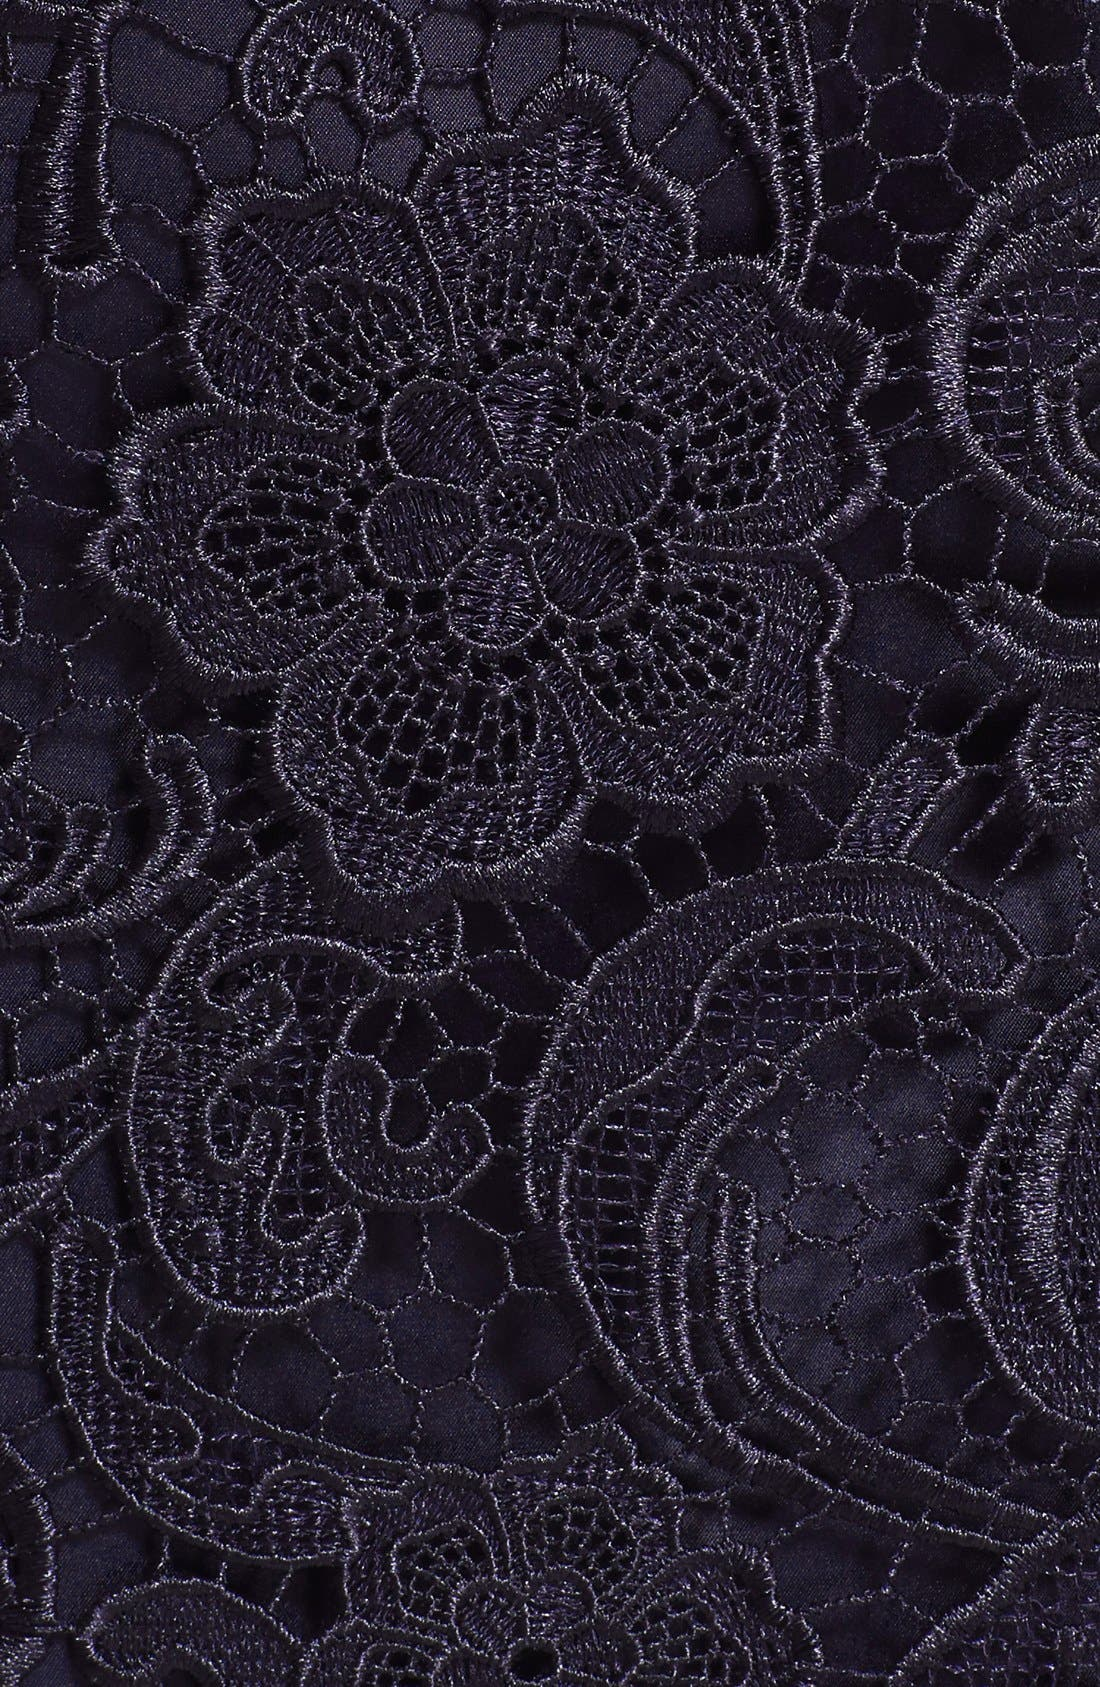 Illusion Bodice Lace Sheath Dress,                             Alternate thumbnail 6, color,                             Navy